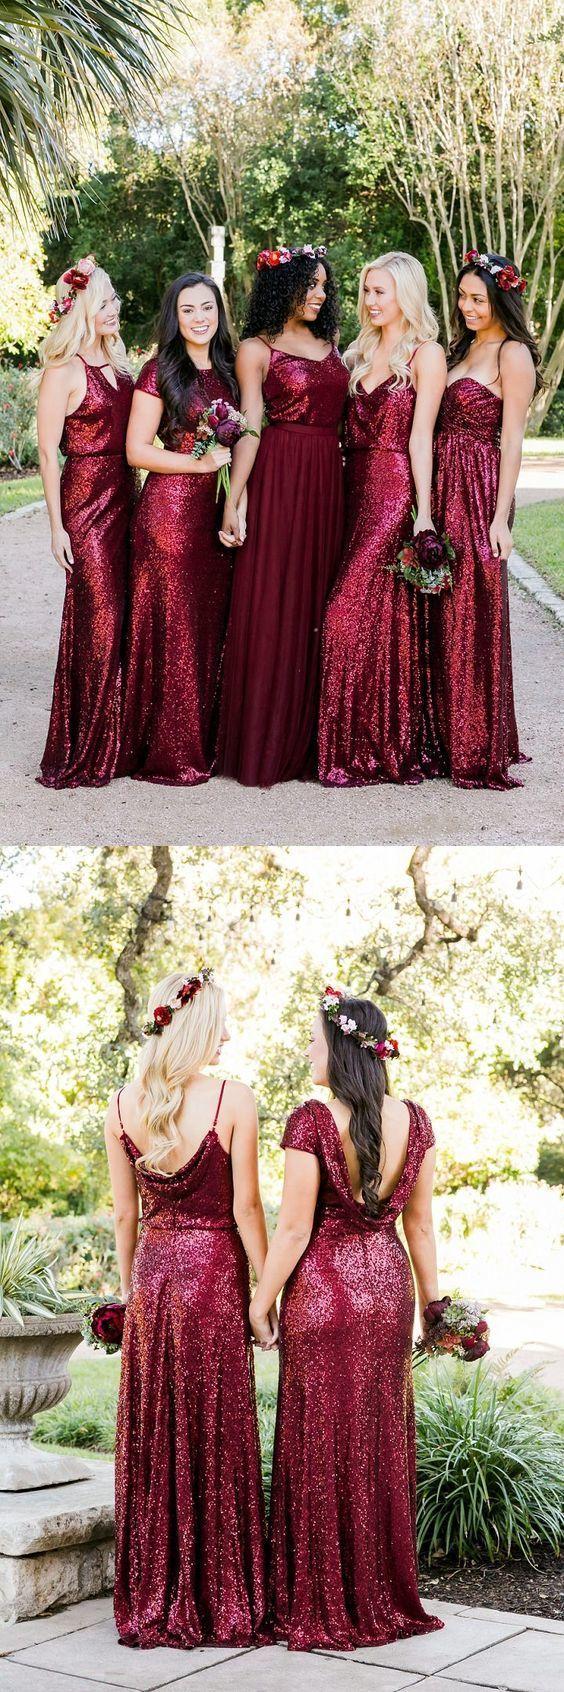 Mismatched Burgundy Bridesmaid Dresses, Sequin Bridesmaid Dresses, Long